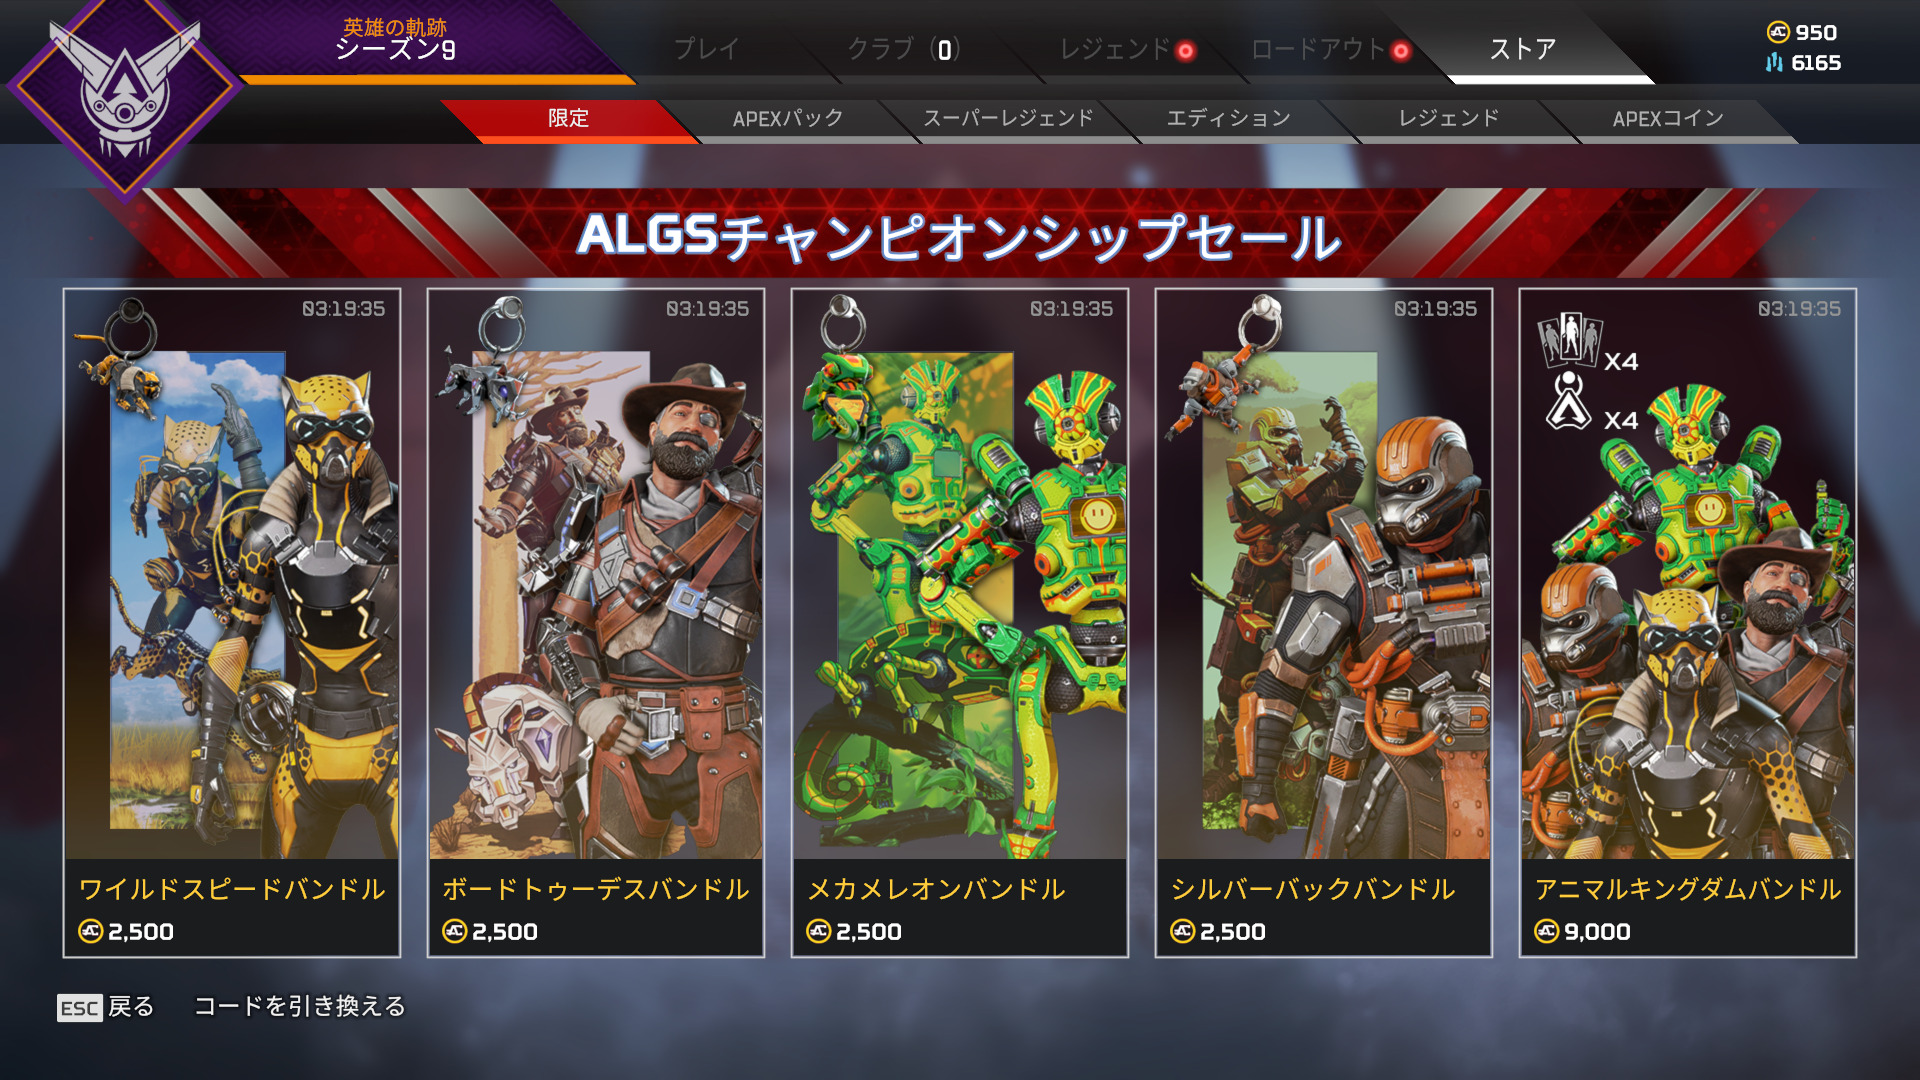 【APEX】ALGSストアの売上でエーペックスの世界大会の賞金が『1億6000万円』増額した模様!!